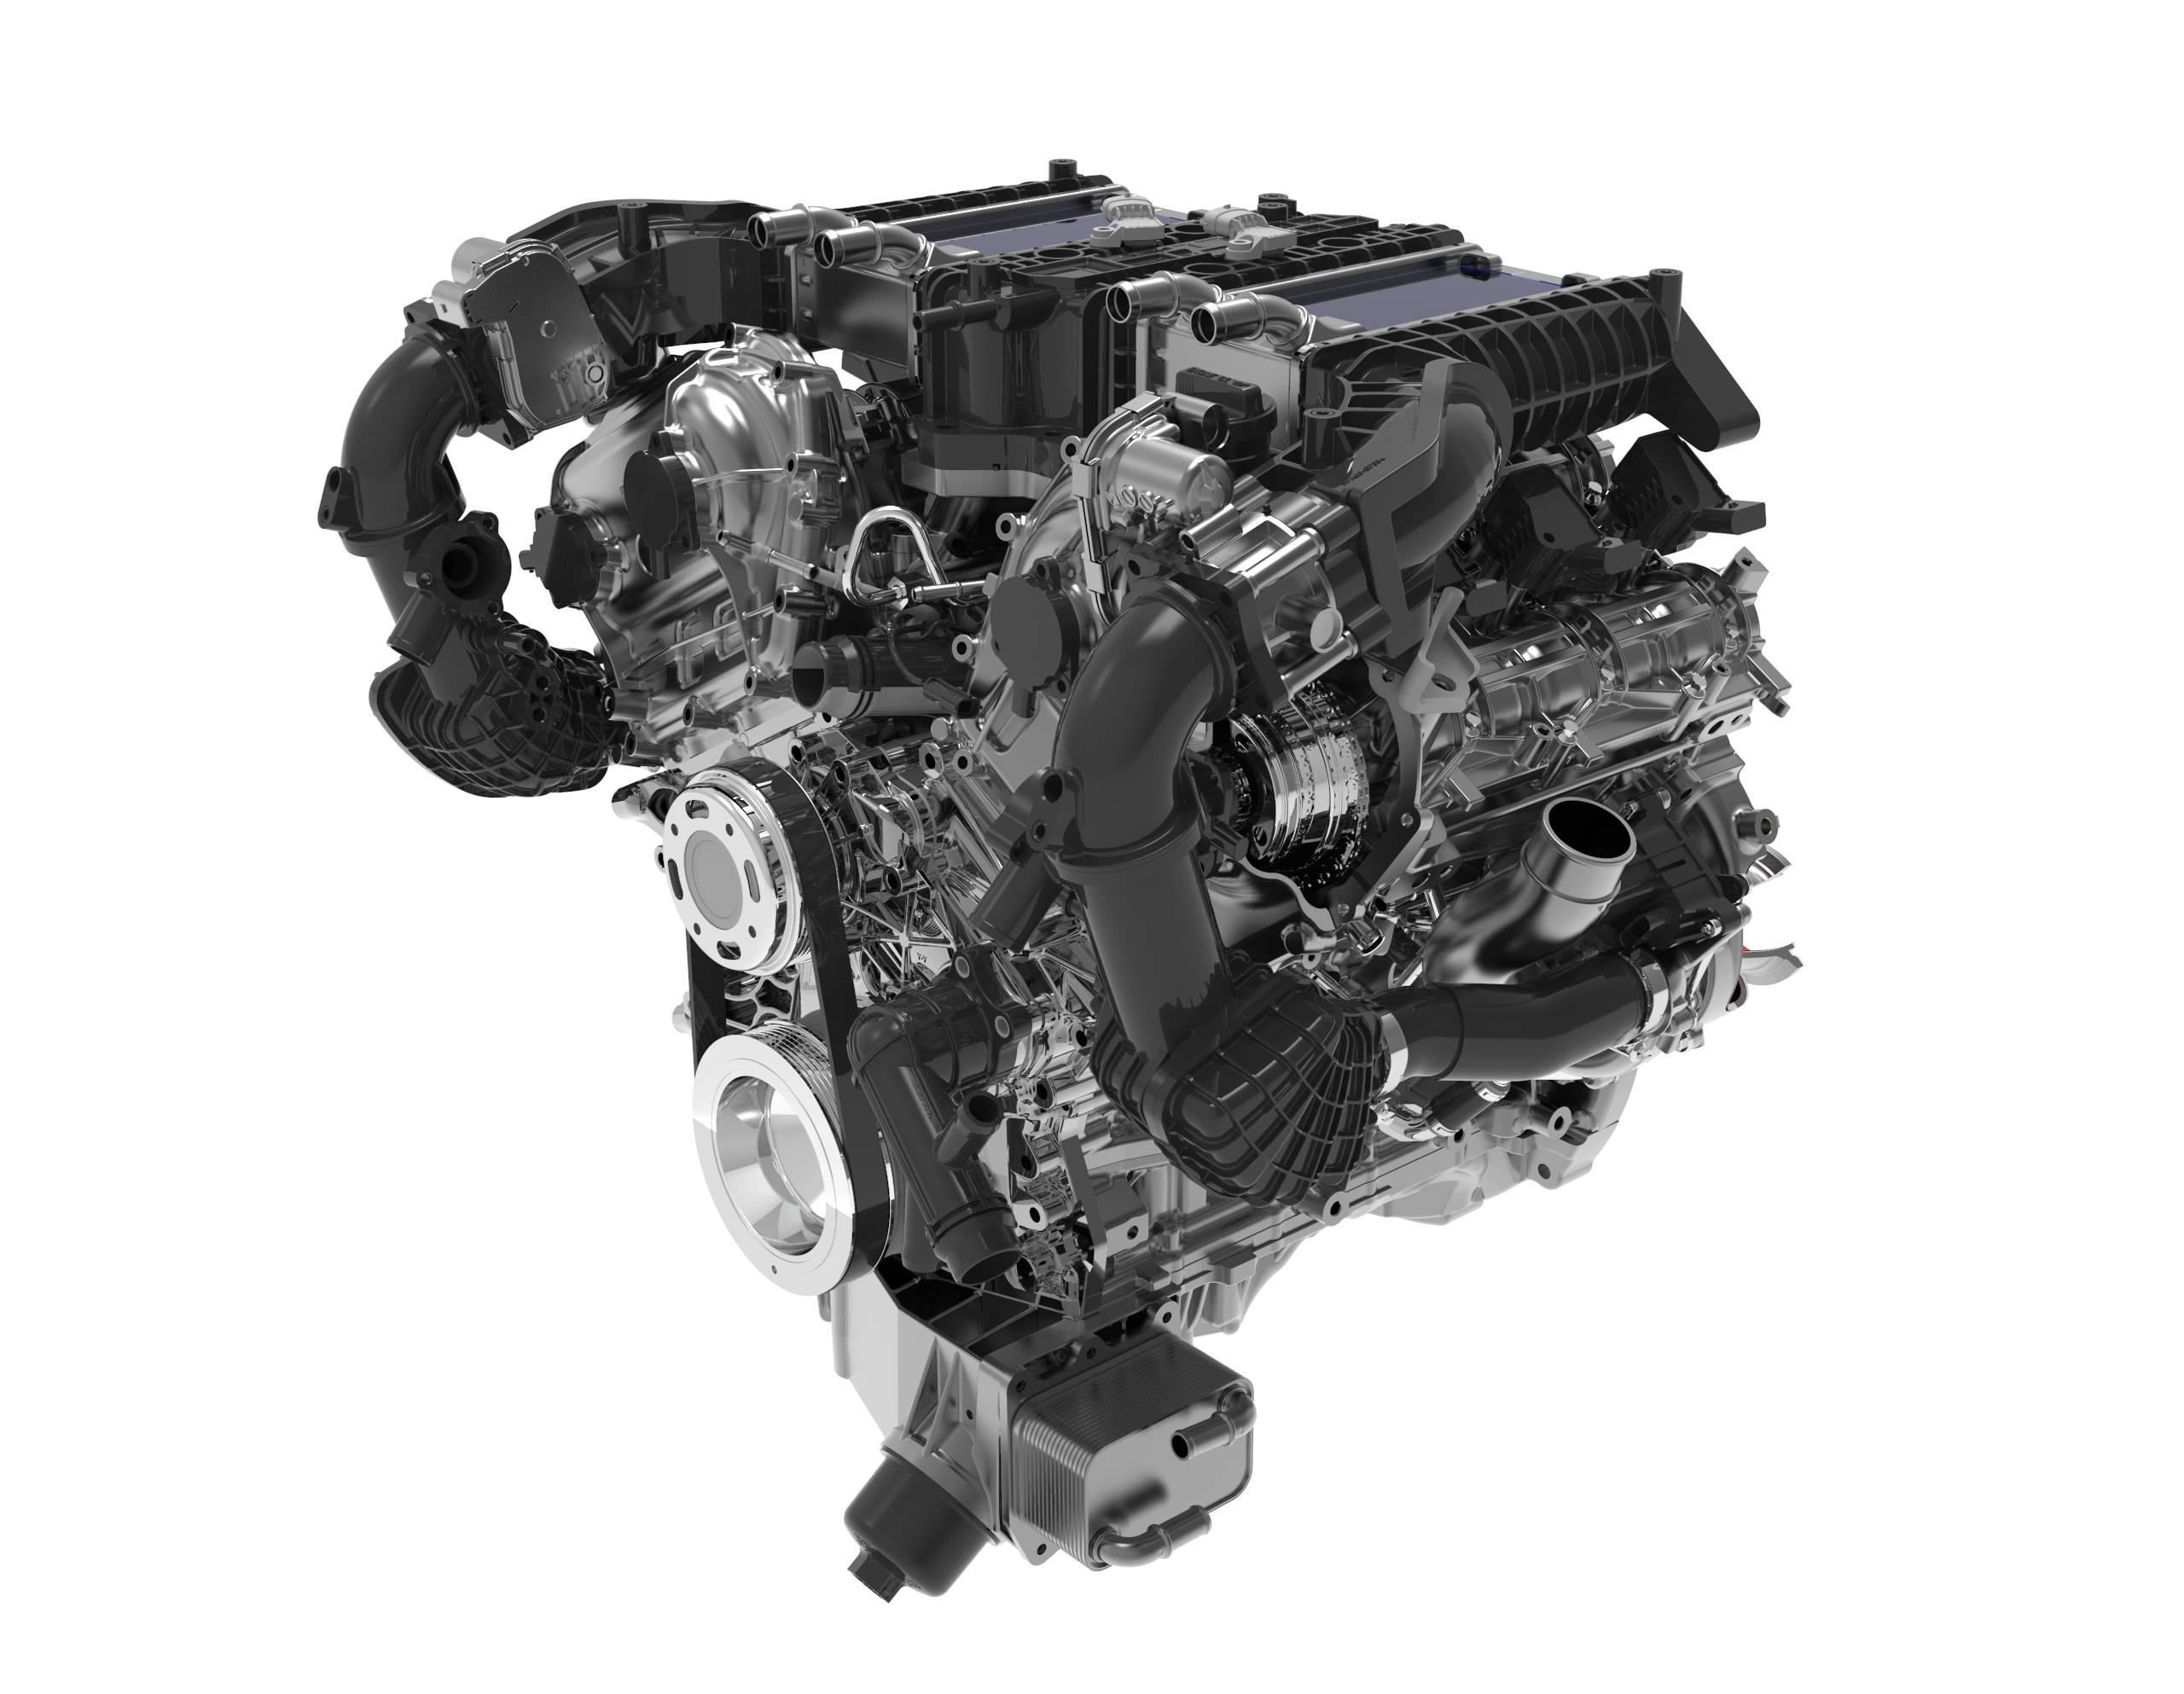 6Z30 3.0T双涡轮增压发动机